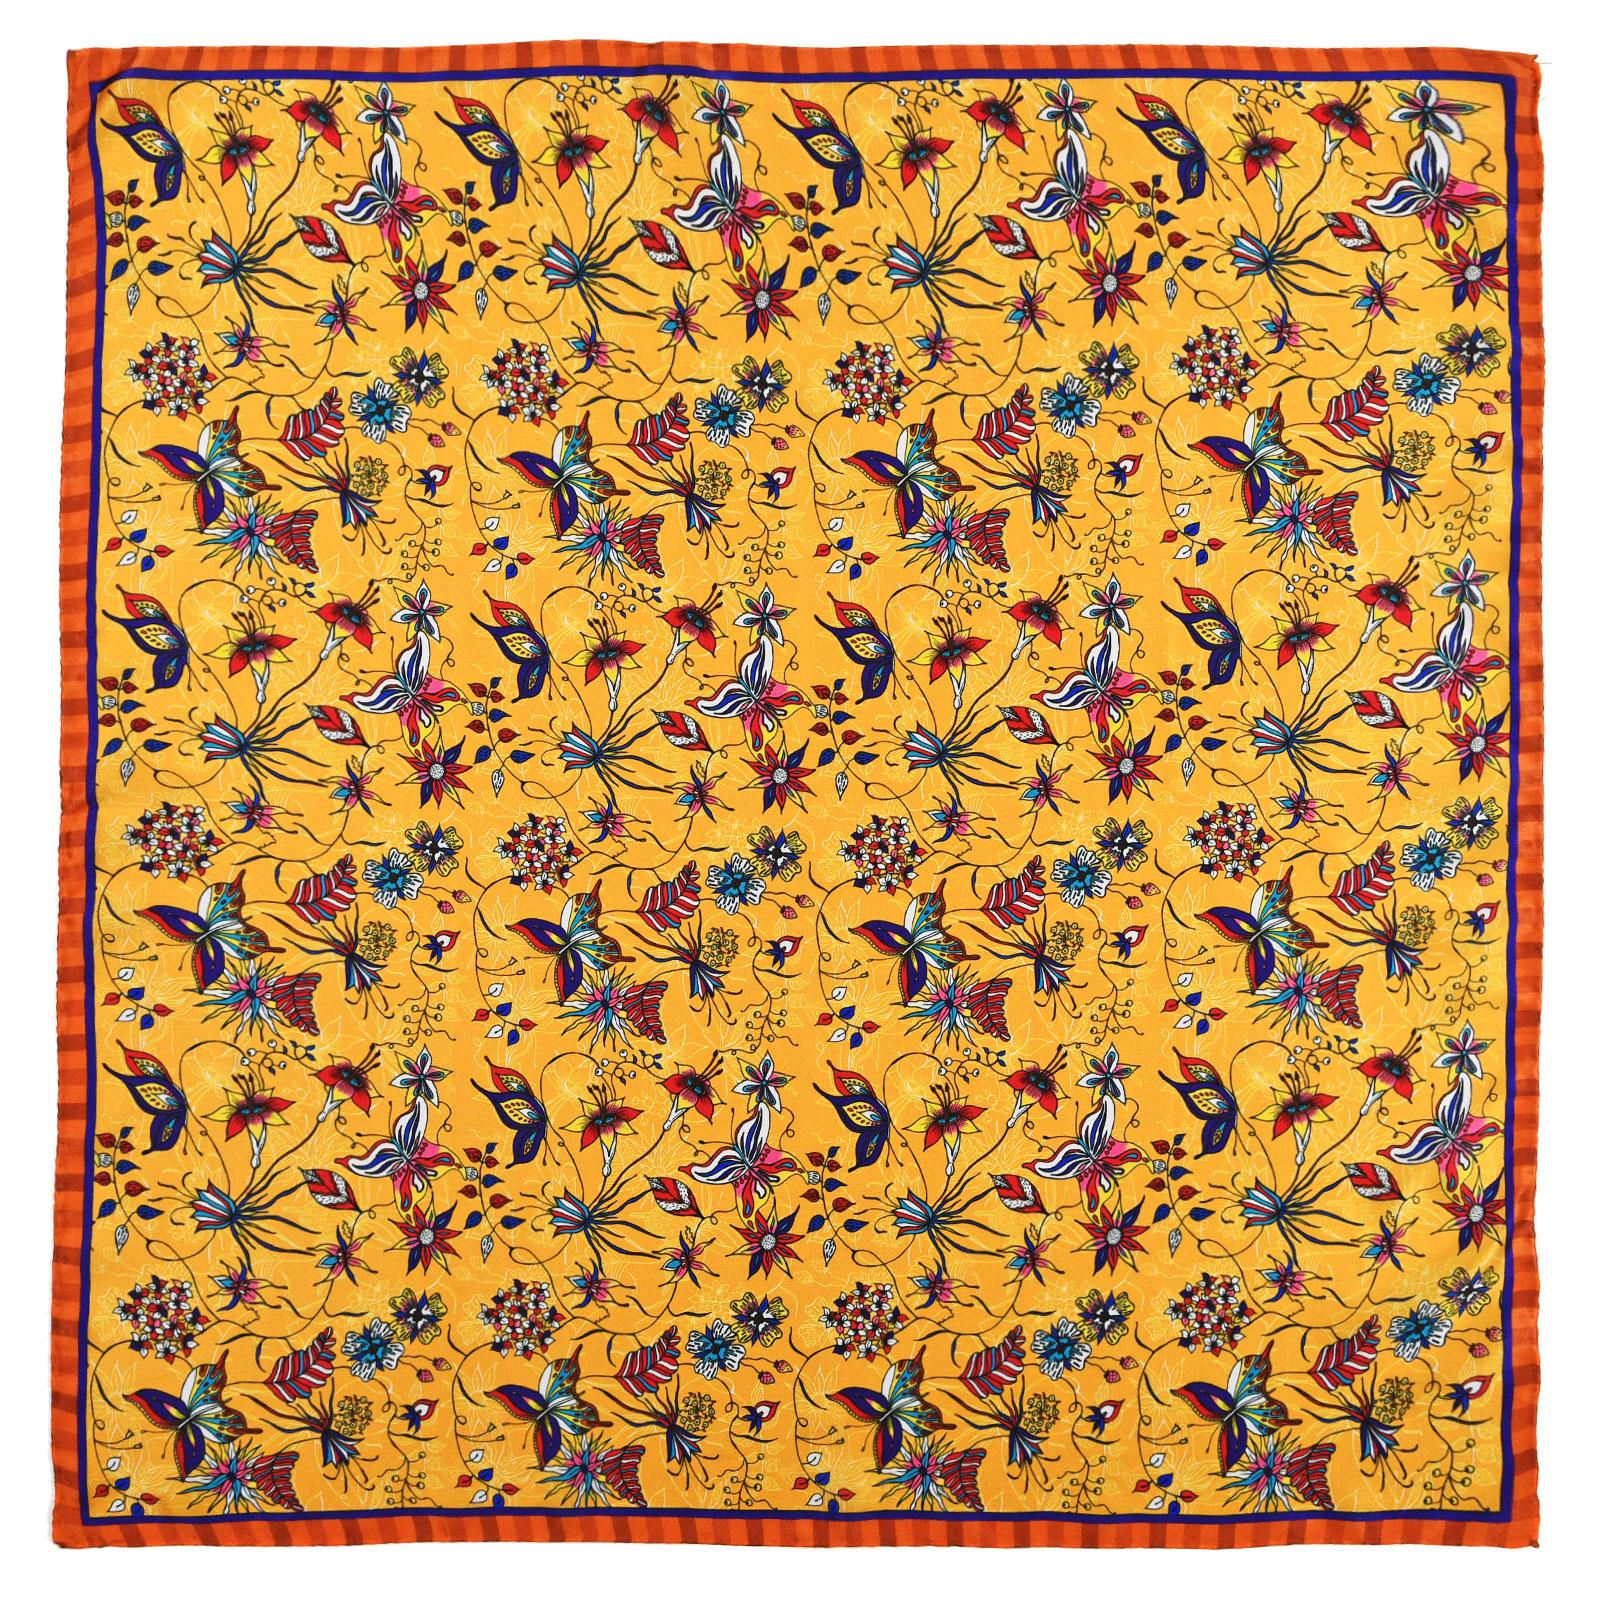 AT-04603-A16-foulard-carre-soie-jaune-orange-made-in-italie